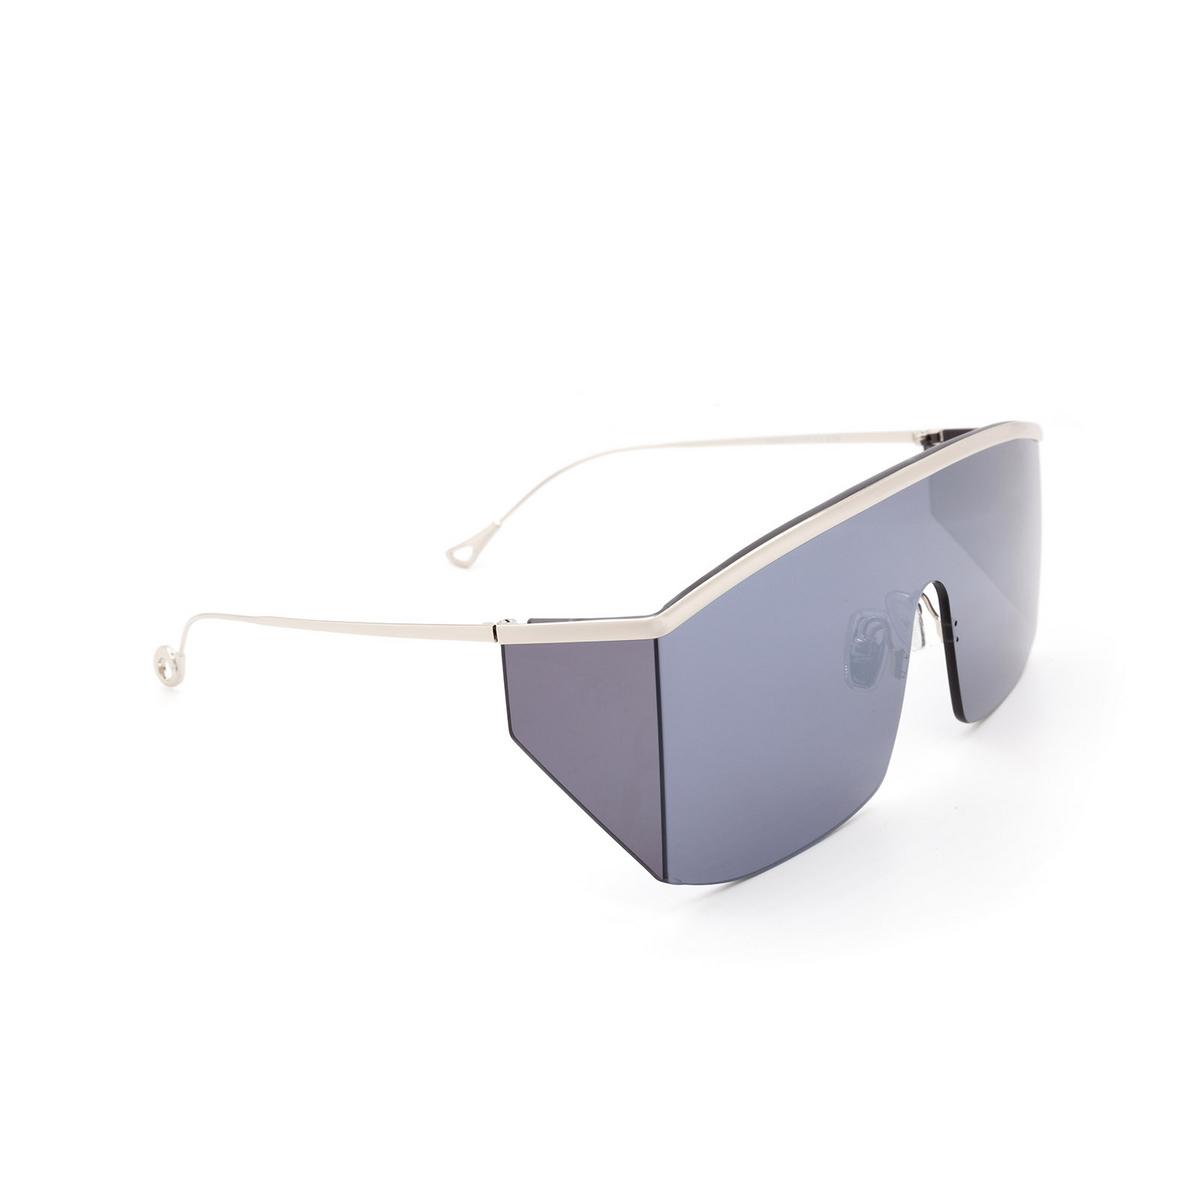 Eyepetizer® Mask Sunglasses: Karl color Silver C.1-7F - three-quarters view.